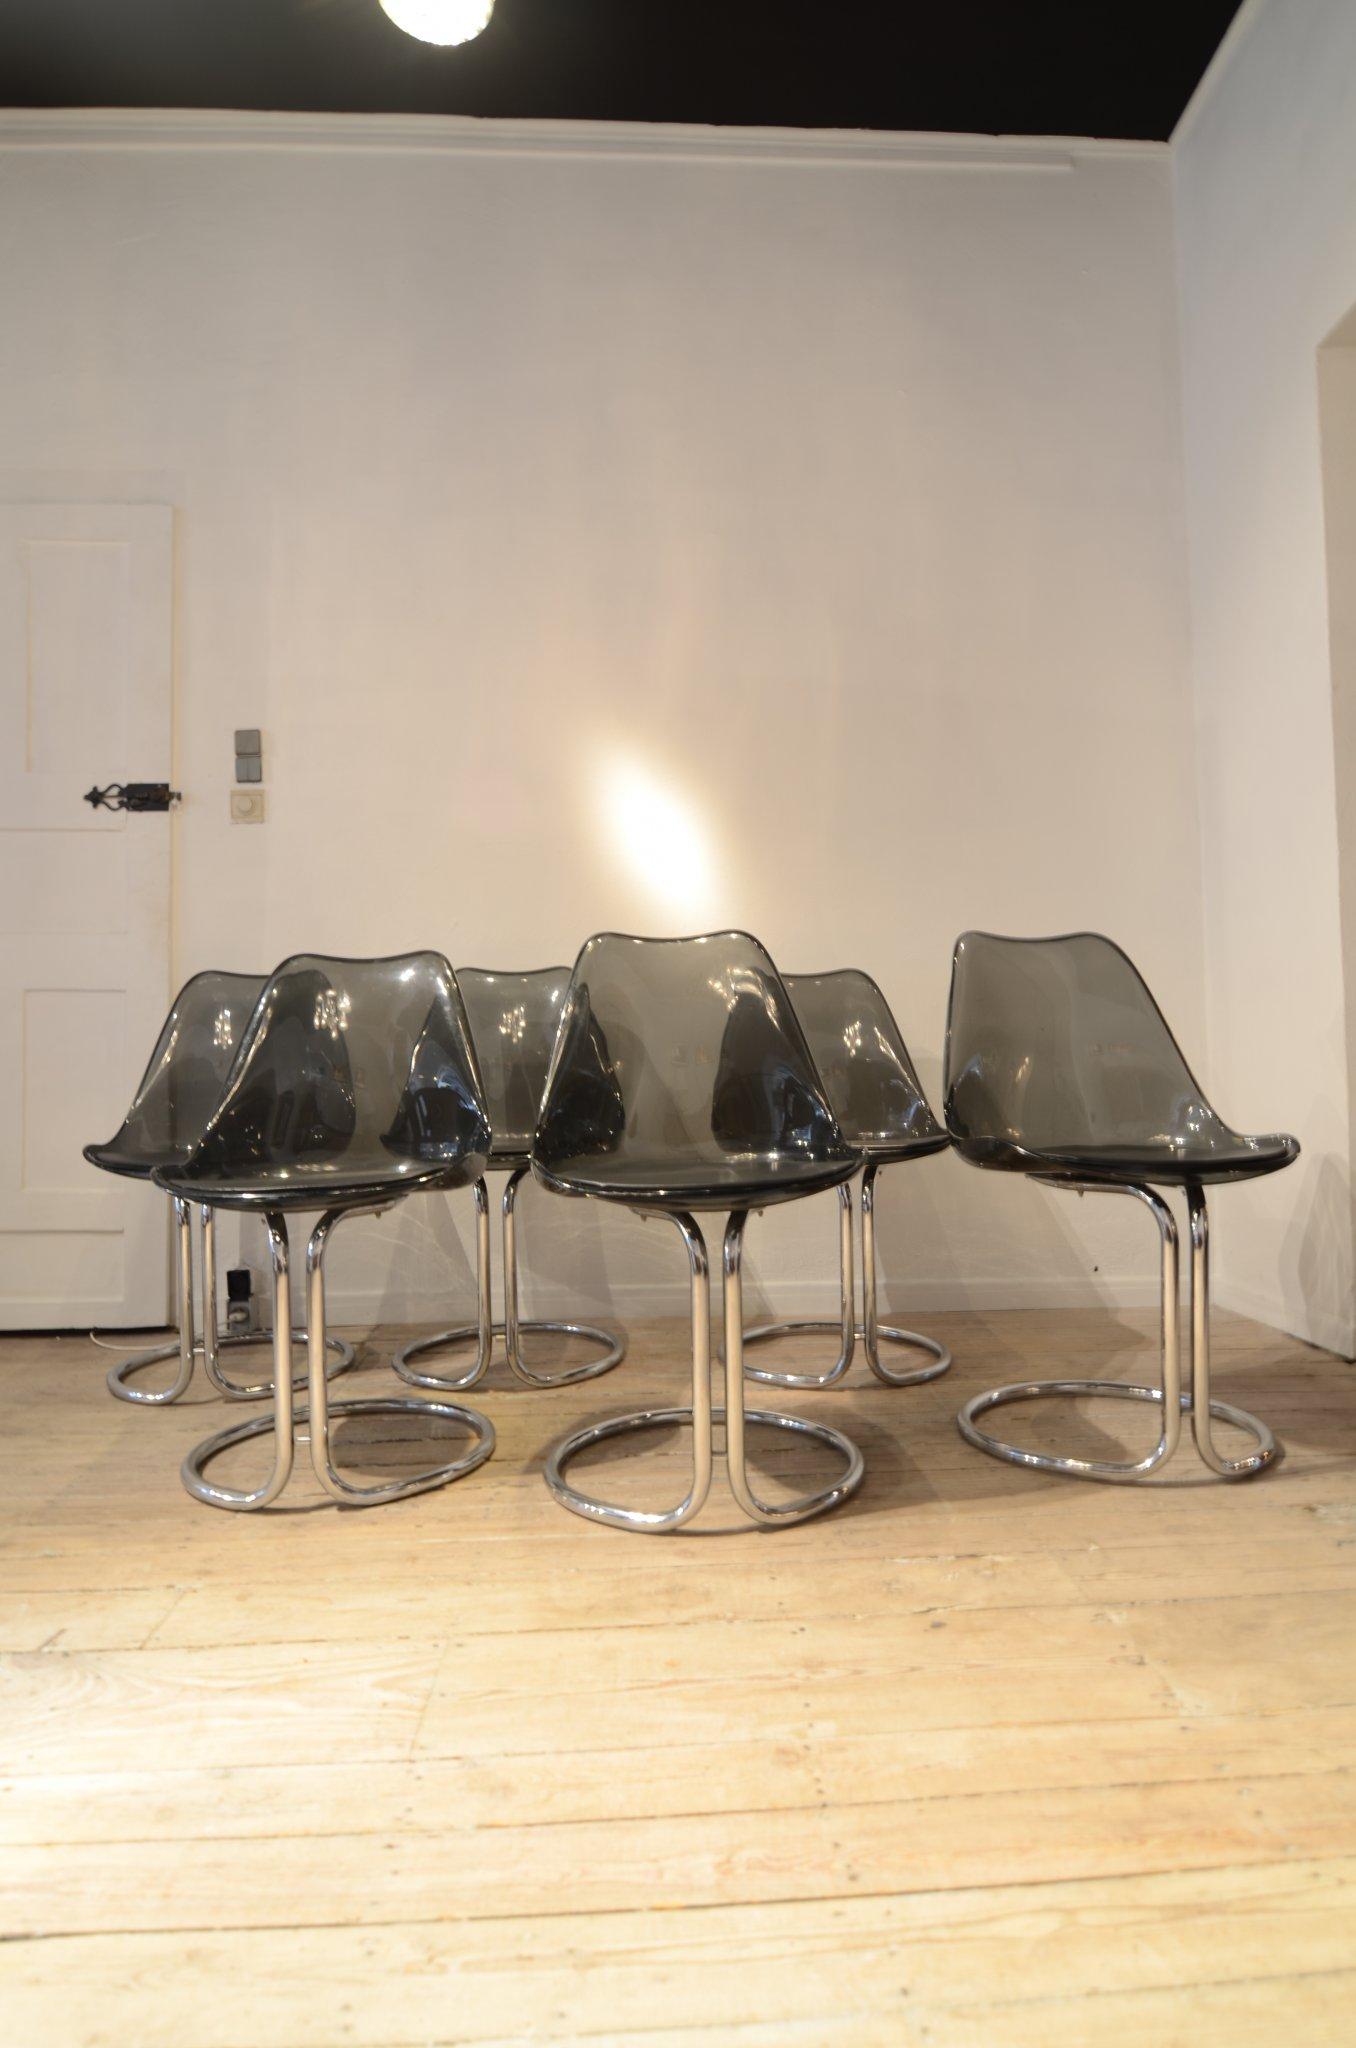 6 chromed leg chairs